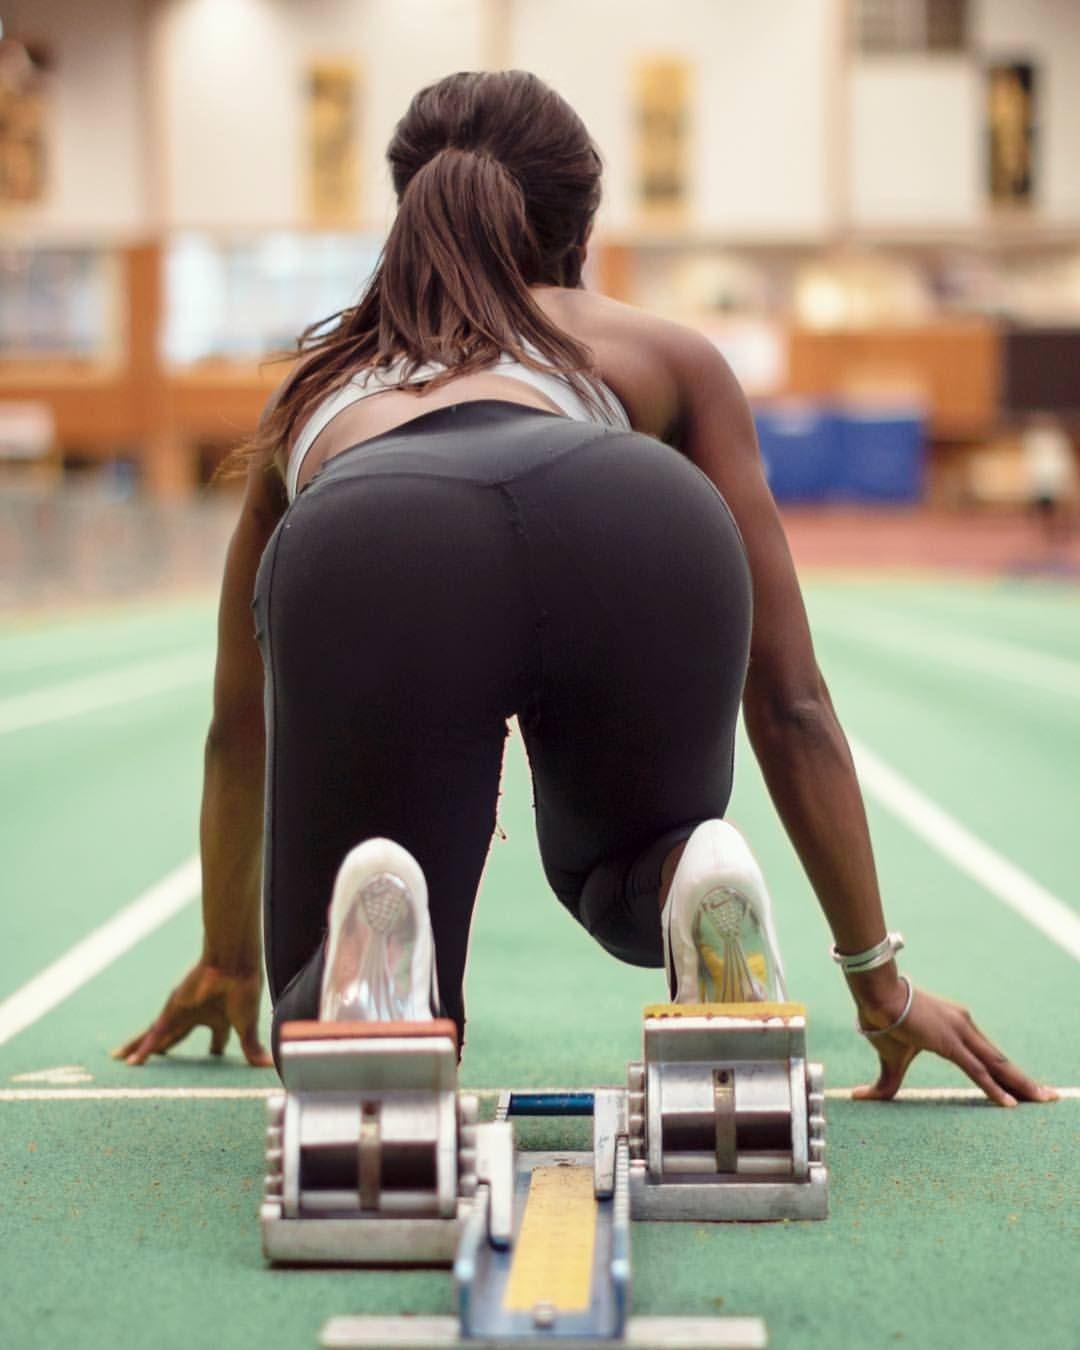 Khaddi Sagnia  Girlsinyogapants  Sports Women, Track -8054